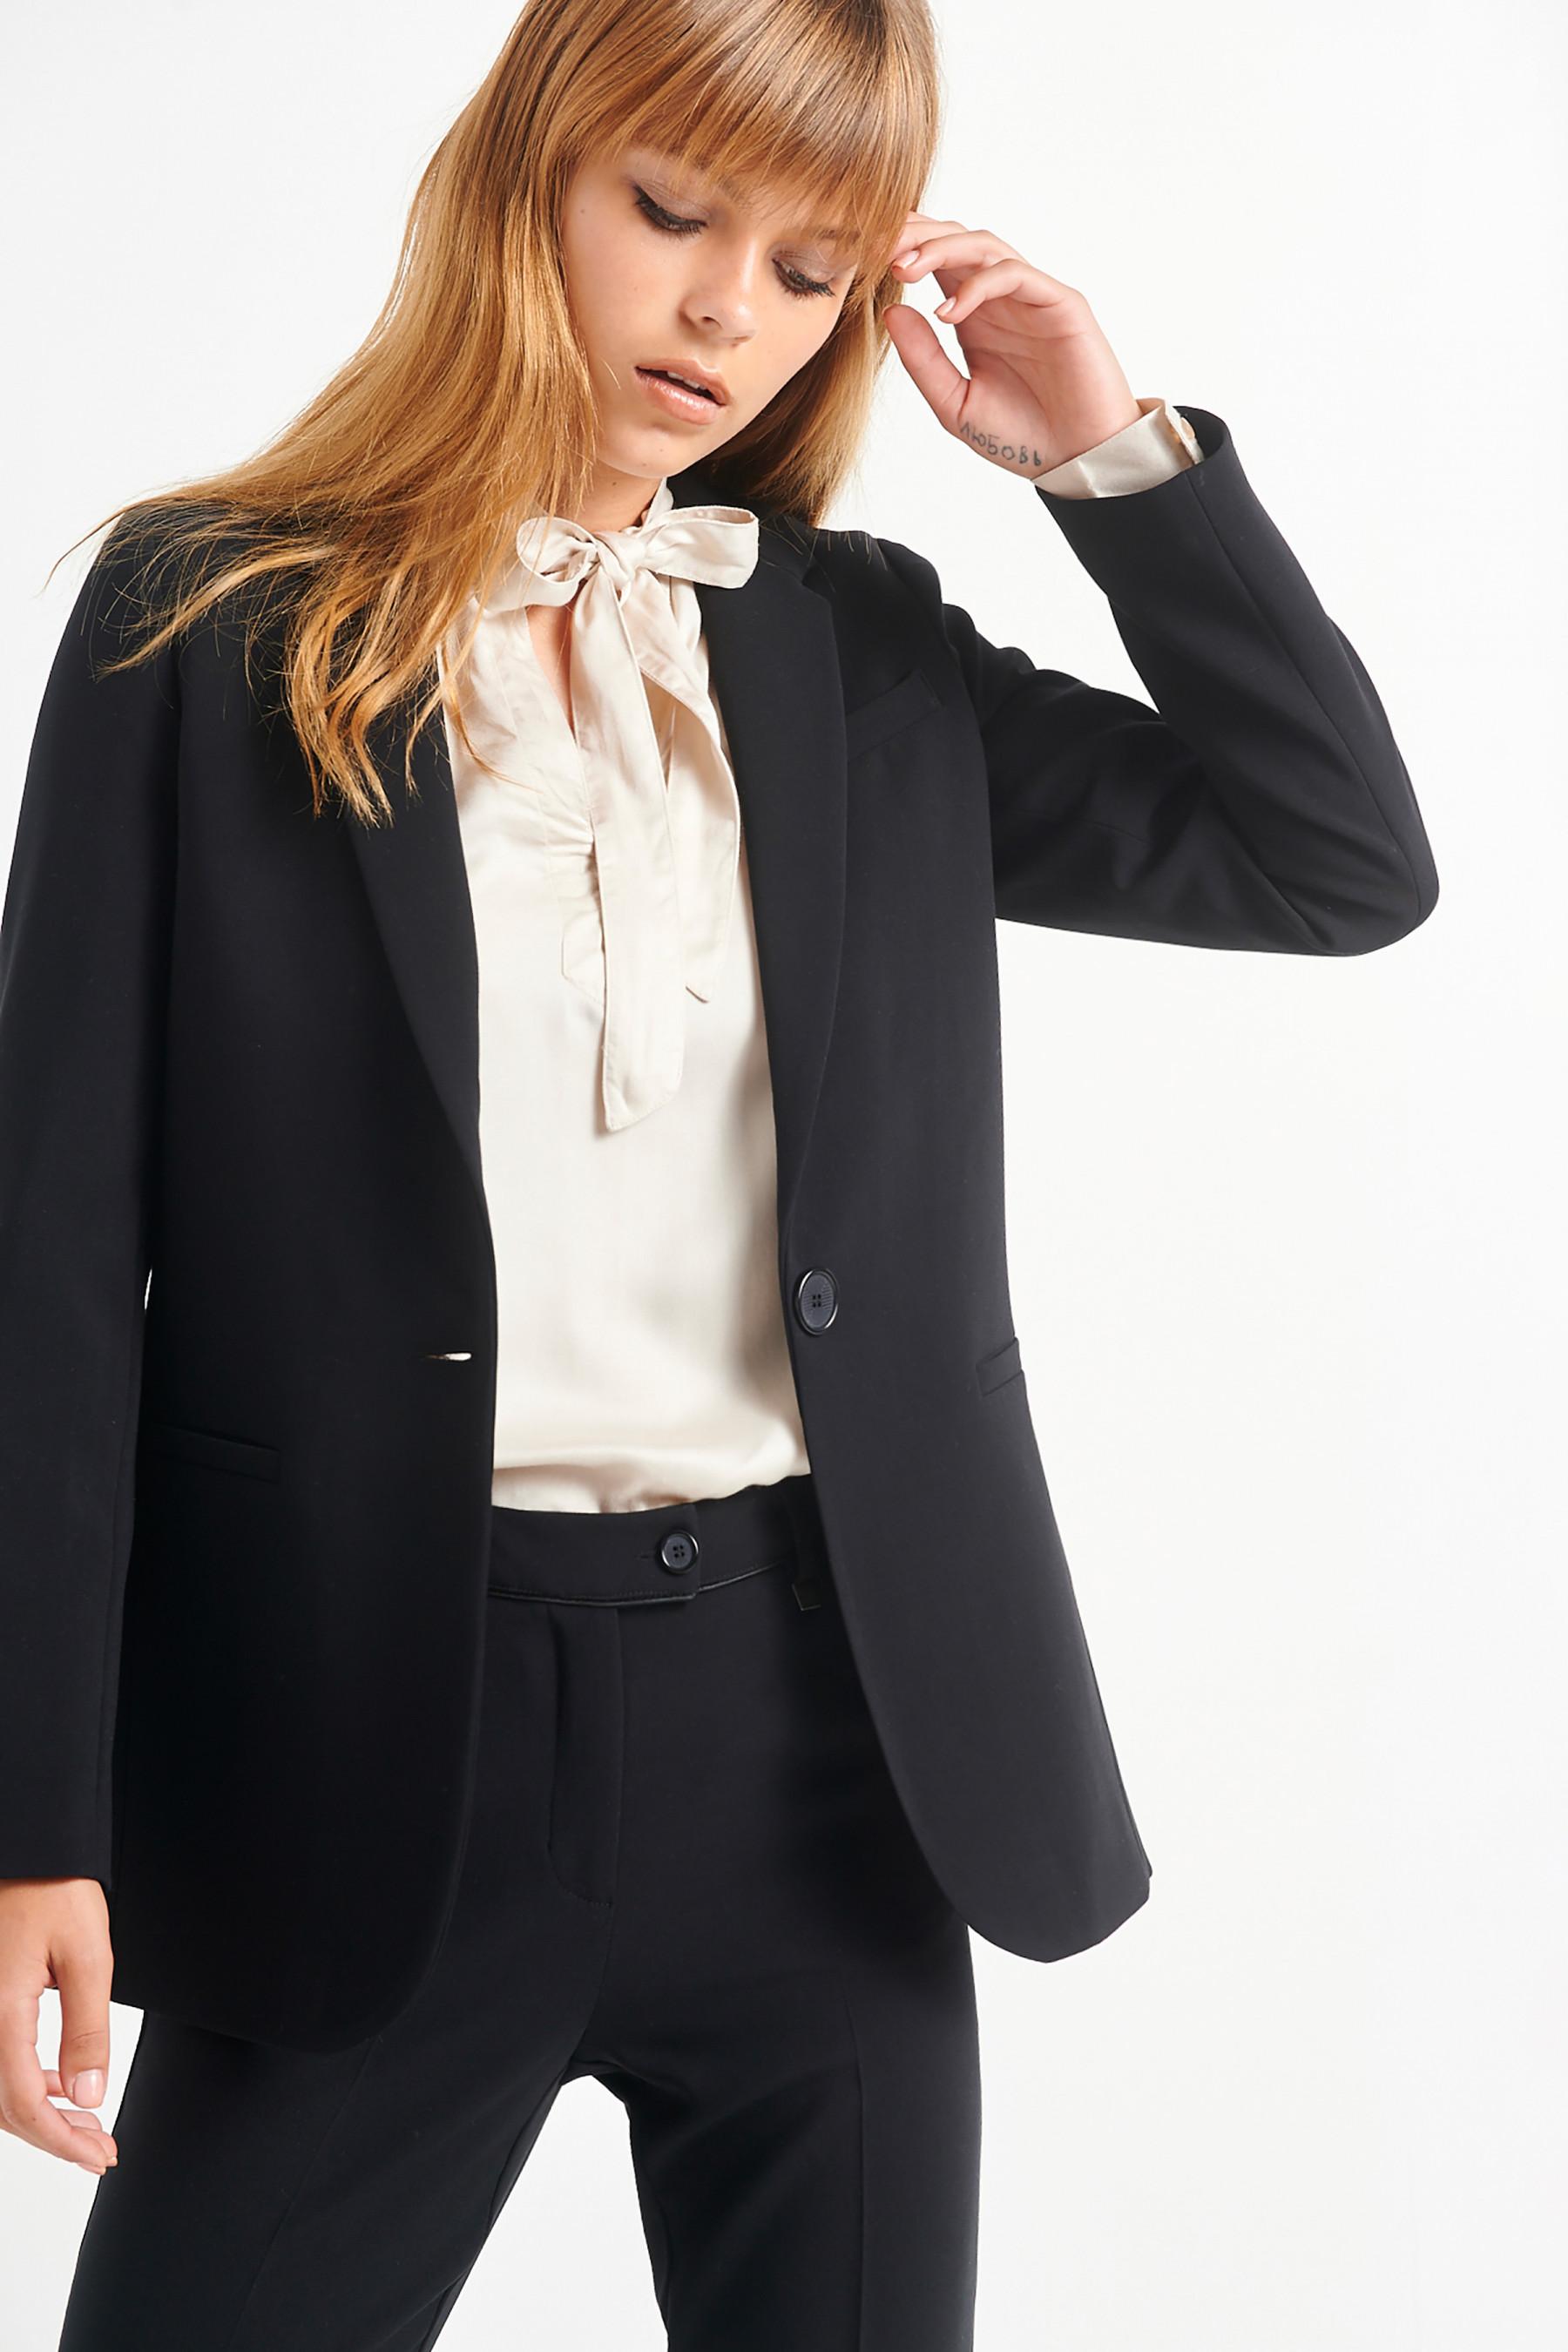 Black is a state of mind: 5 basic, μαύρα ρούχα που αν τα αποκτήσεις φέτος θα είσαι κομψή για πάντα